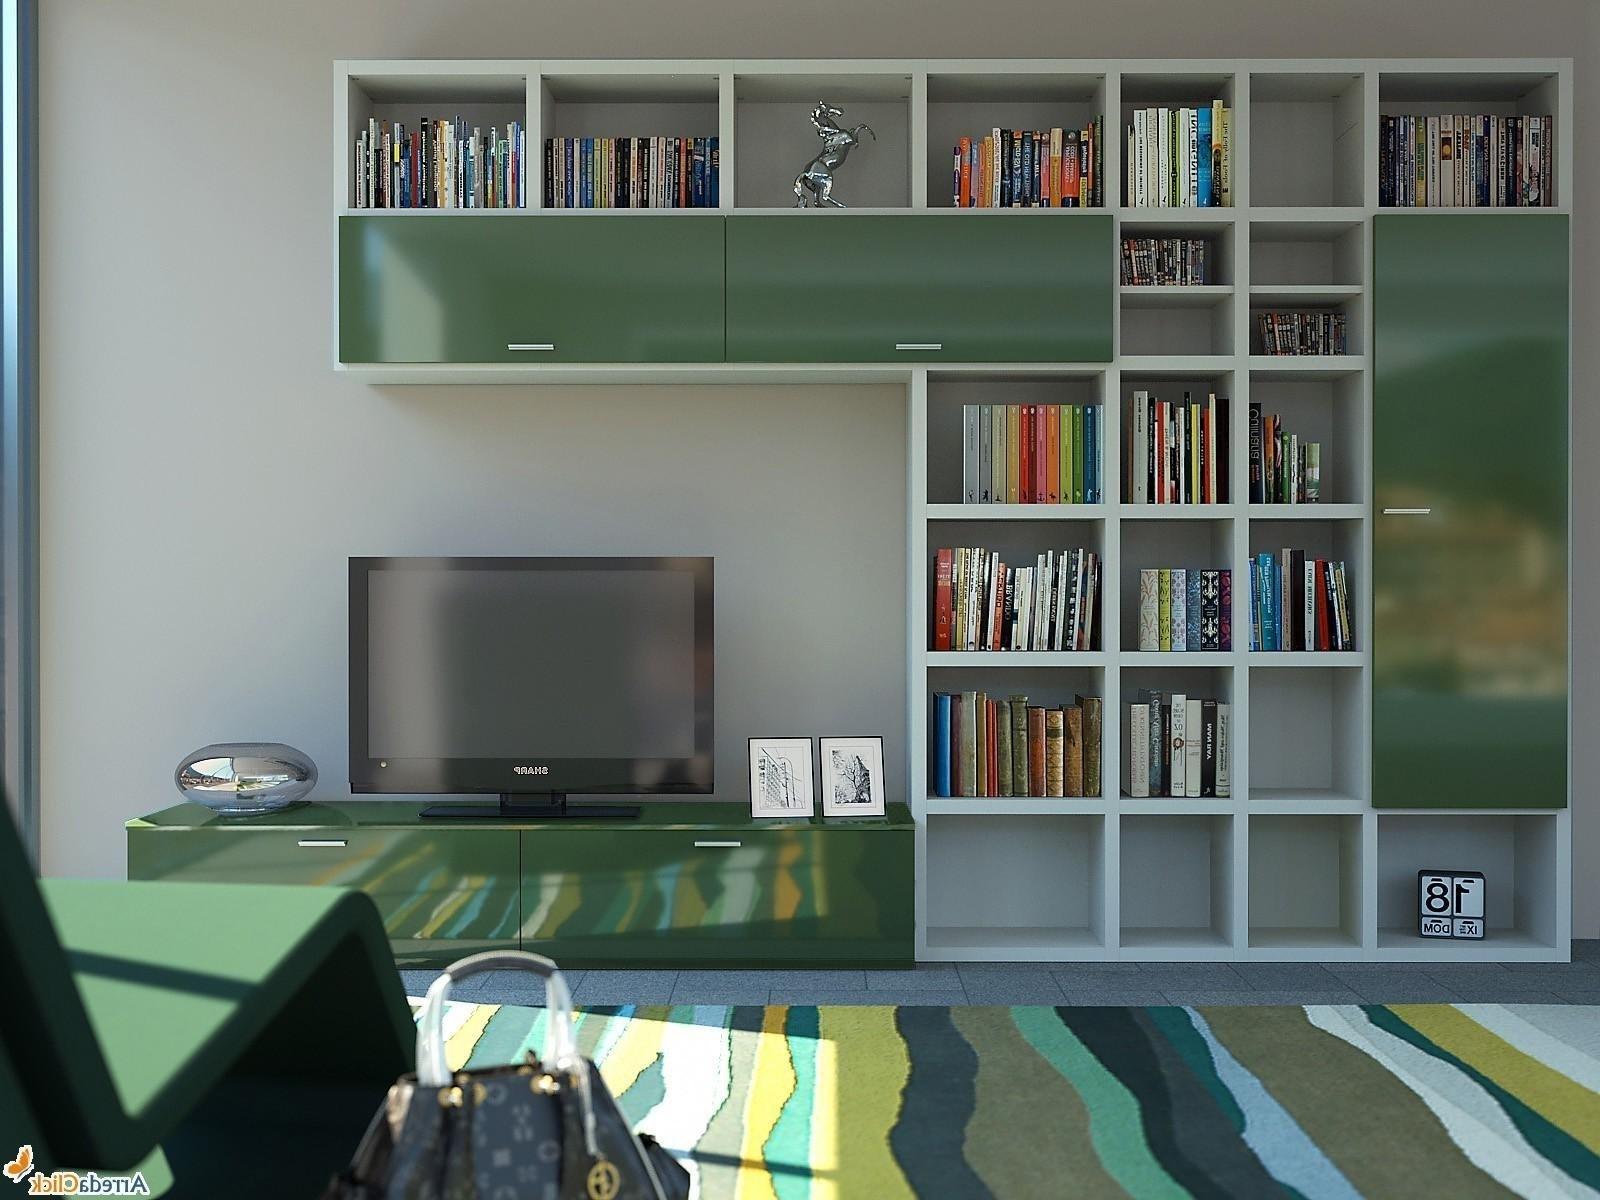 Bookcase Designs Fabulous Some Best And Unique Bookcase Designs Pertaining To Tv In Bookcase (#3 of 14)